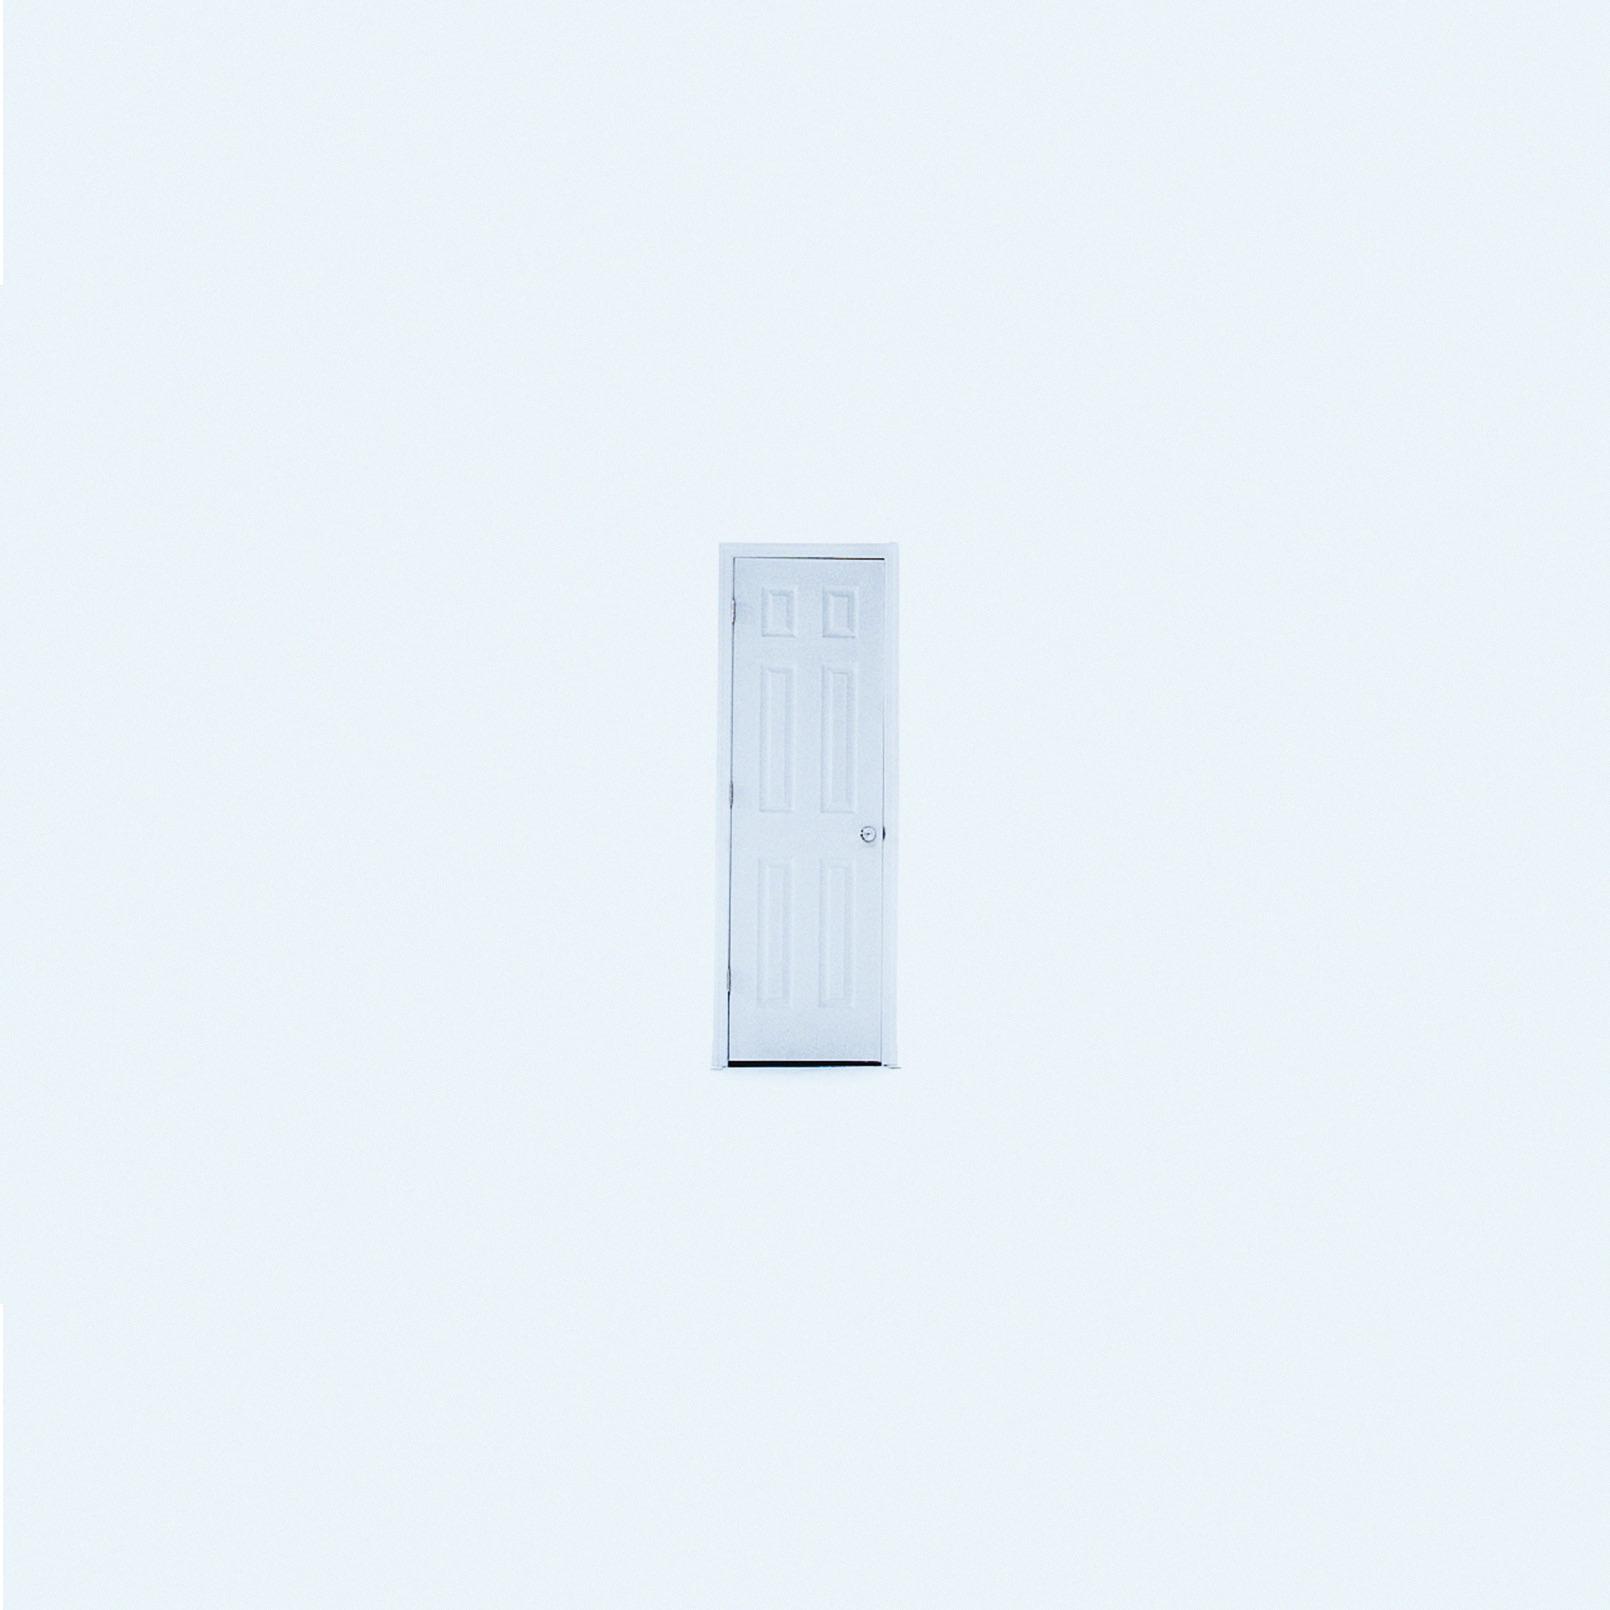 Vespera - Bloom [single] (2017)